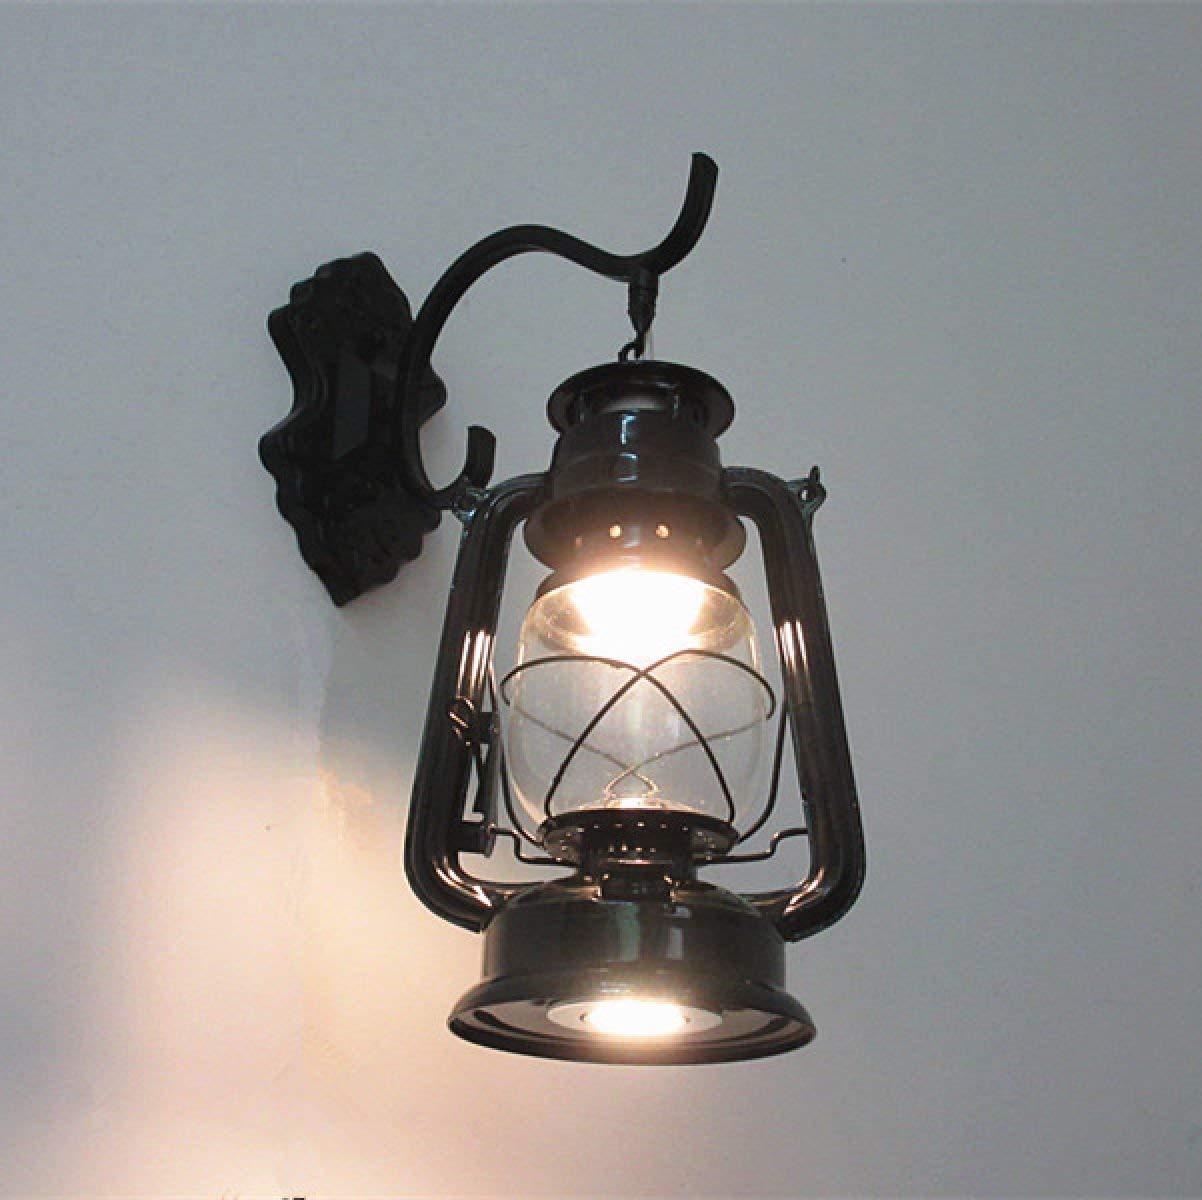 Chuiqingwang アイアンアンティークホースランプウォールランプレトロノスタルジックアイアンウォールランプ (Color : A) B07S68W8HQ A